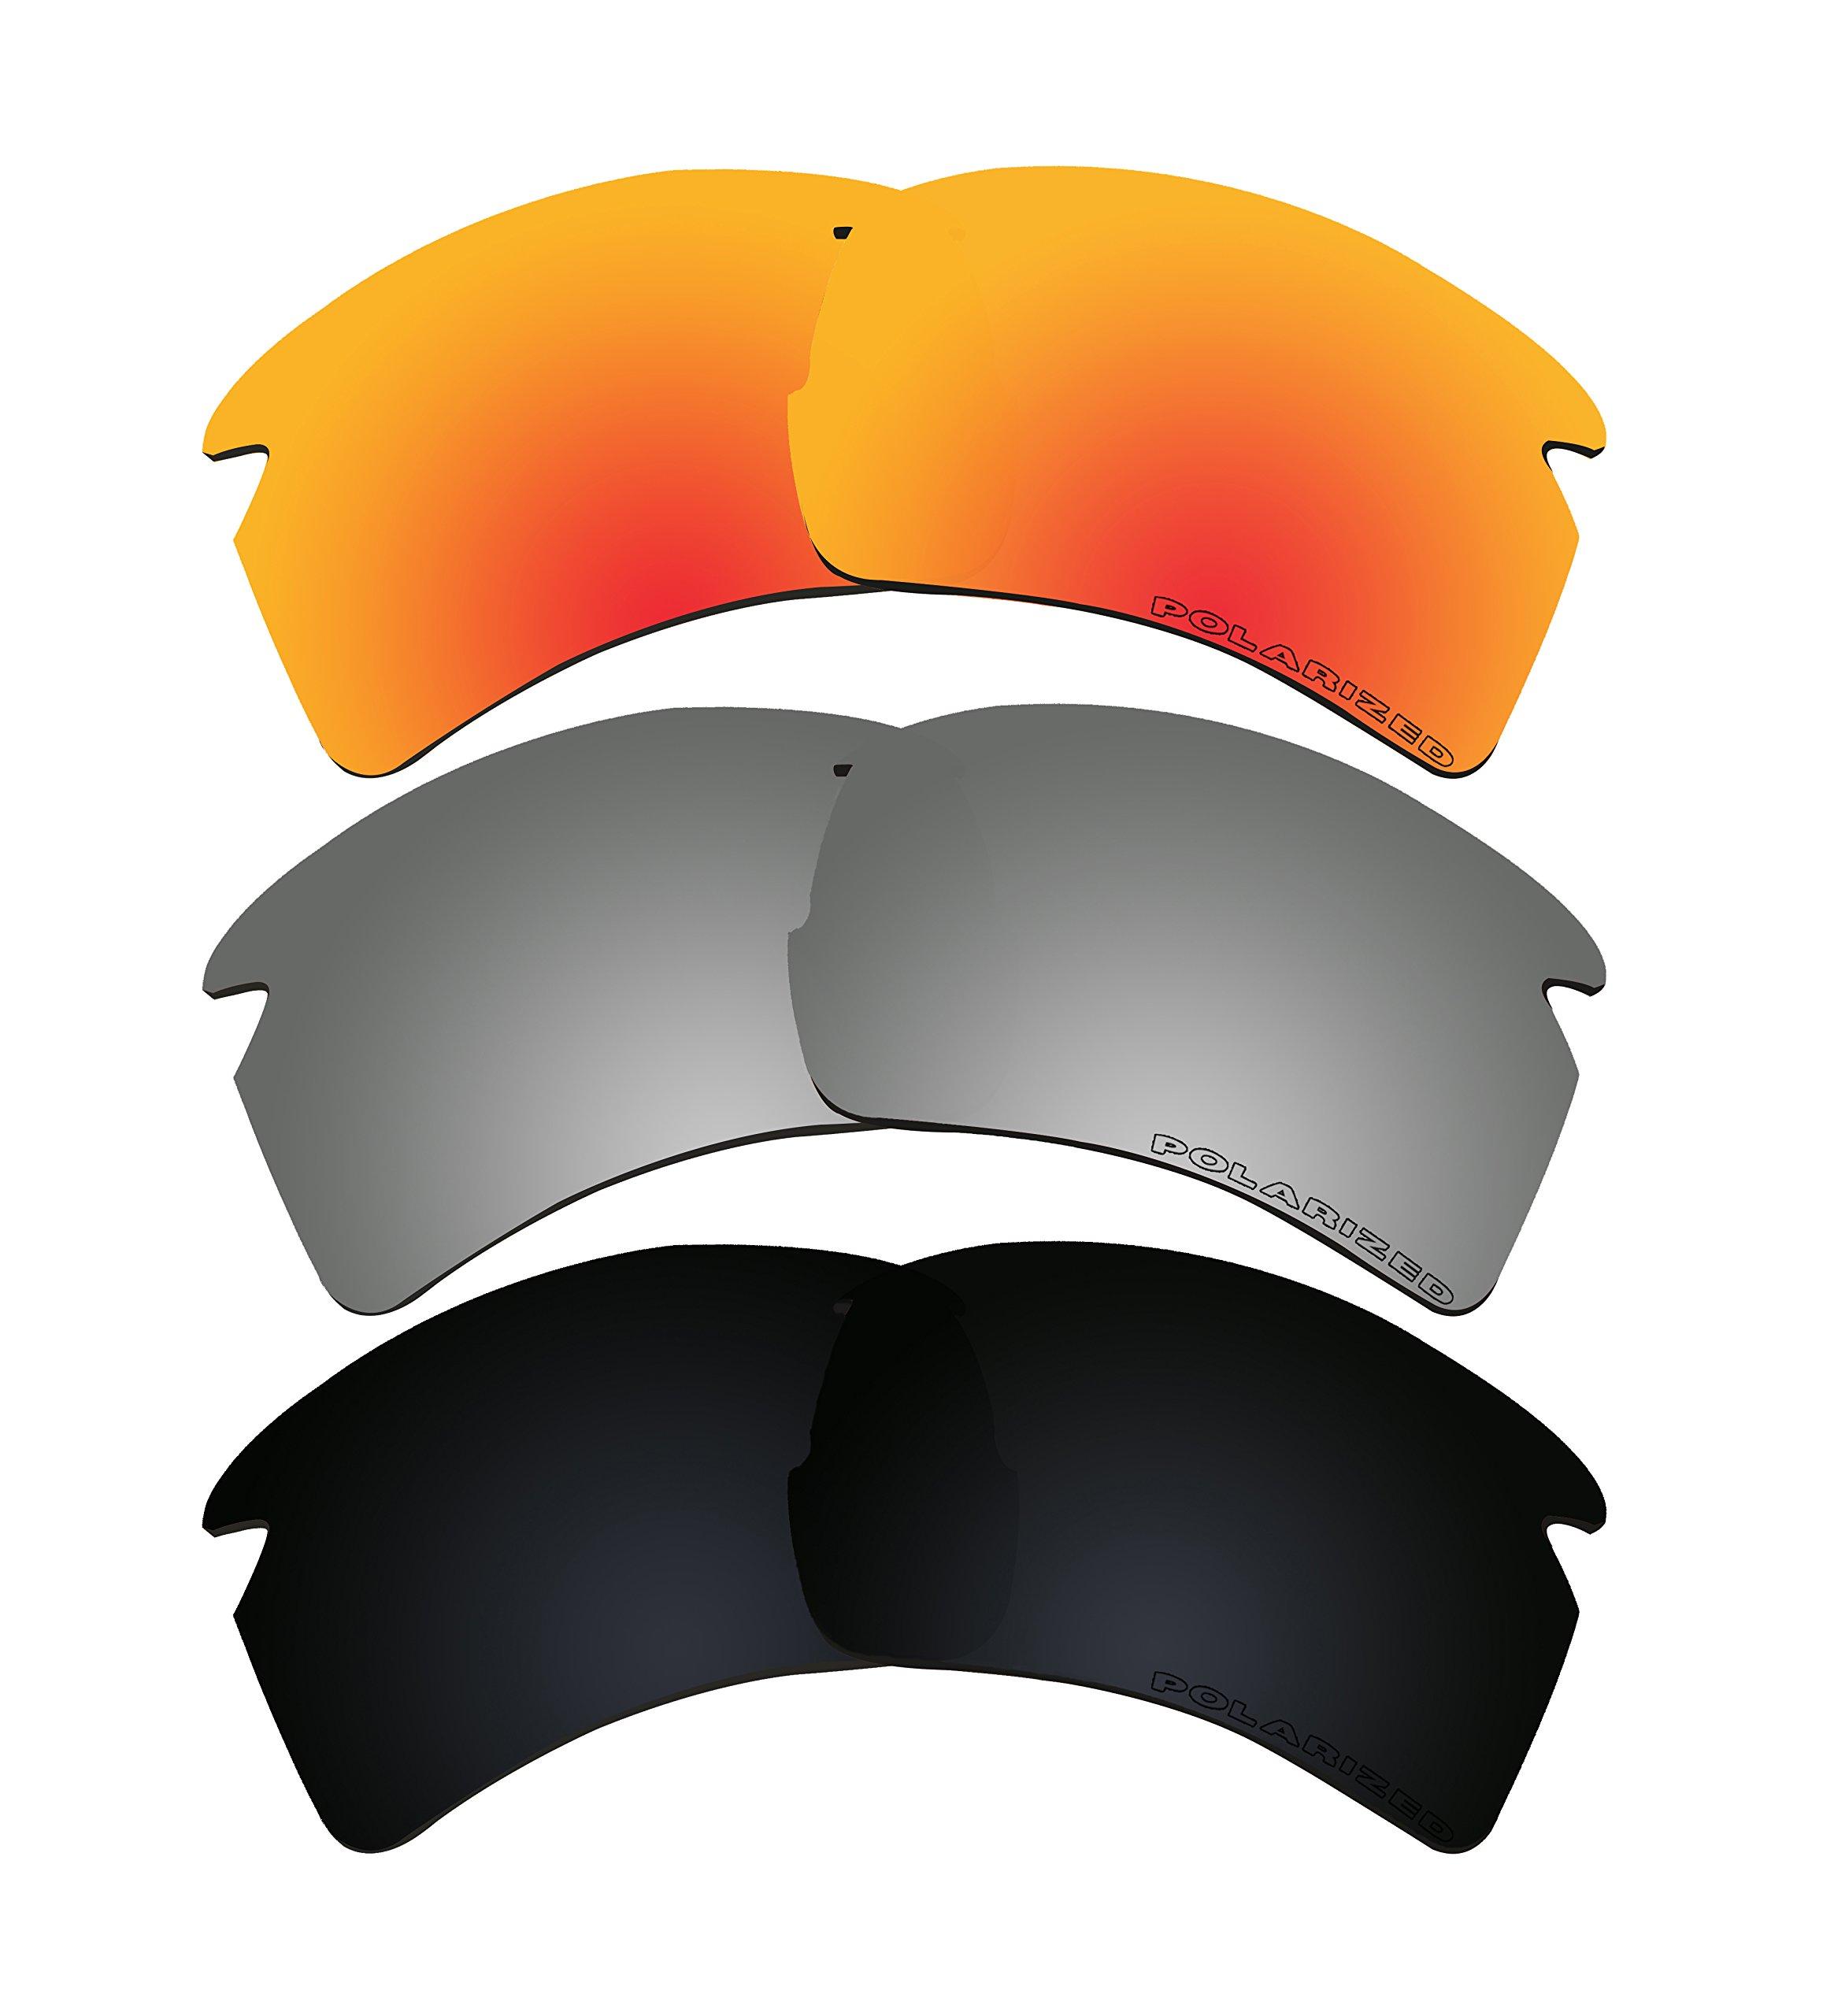 3 Pairs Polarized Lenses Replacement K1 for Oakley FLAK 2.0 XL Sunglasses